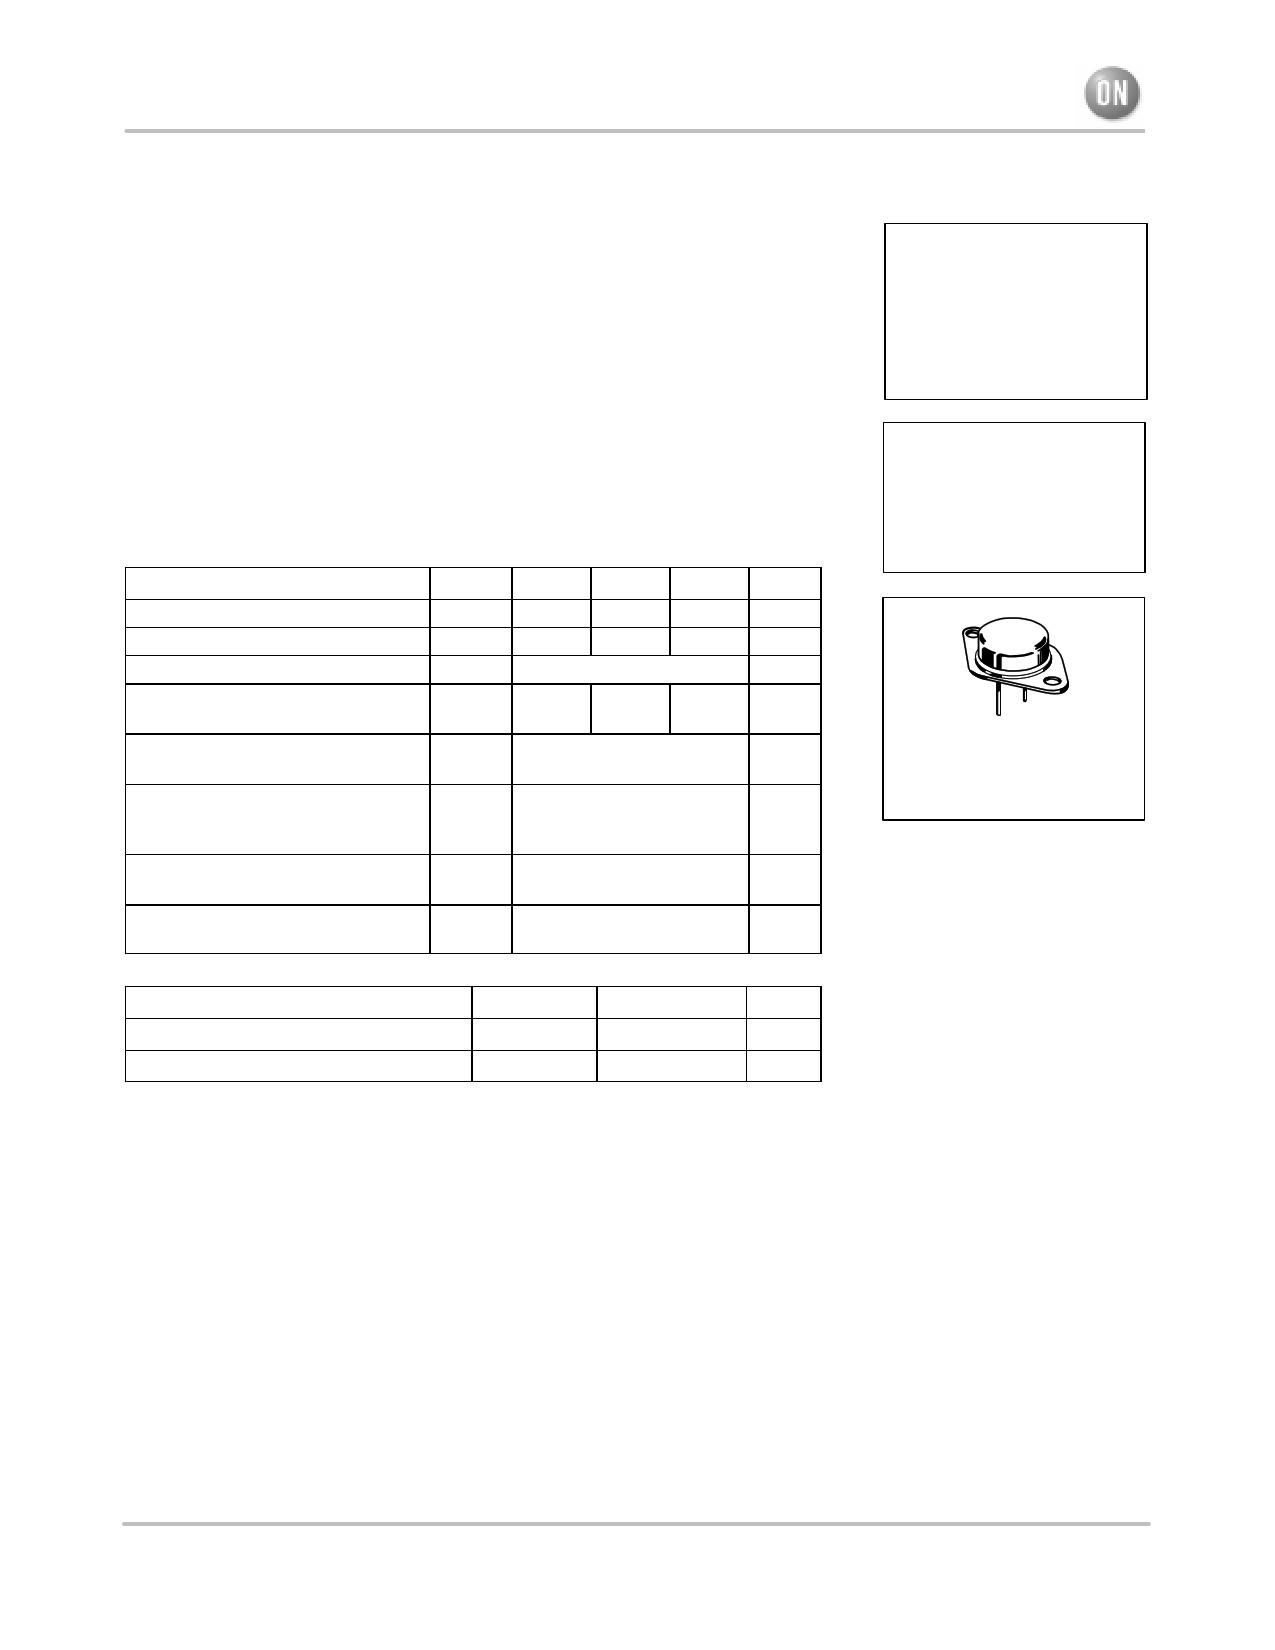 2N4399 datasheet